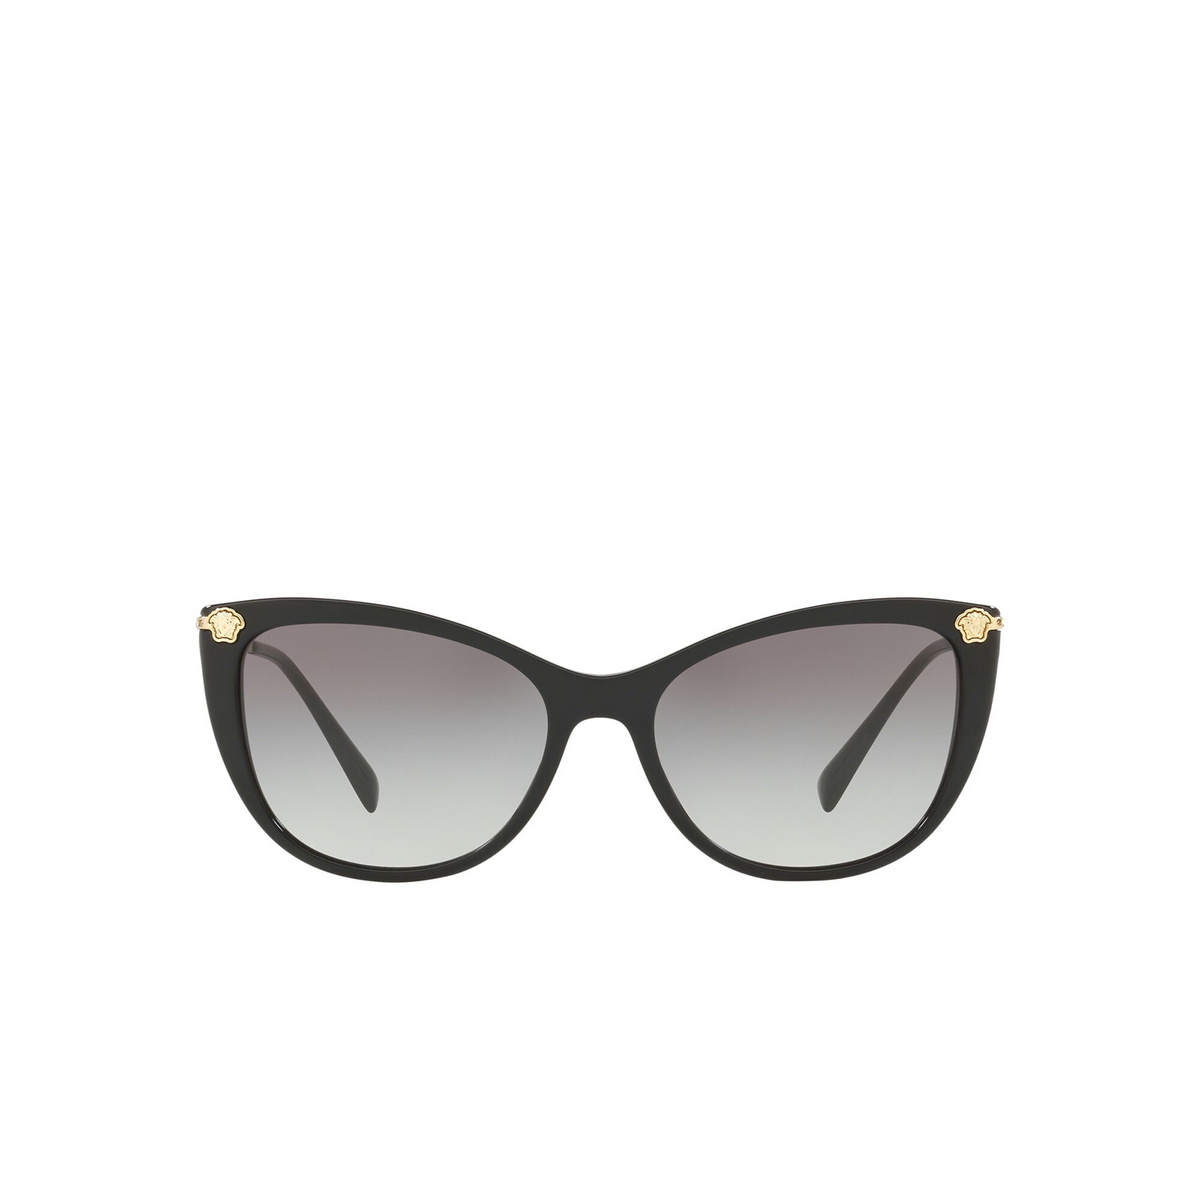 Versace® Cat-eye Sunglasses: VE4345B color Black GB1/11 - front view.